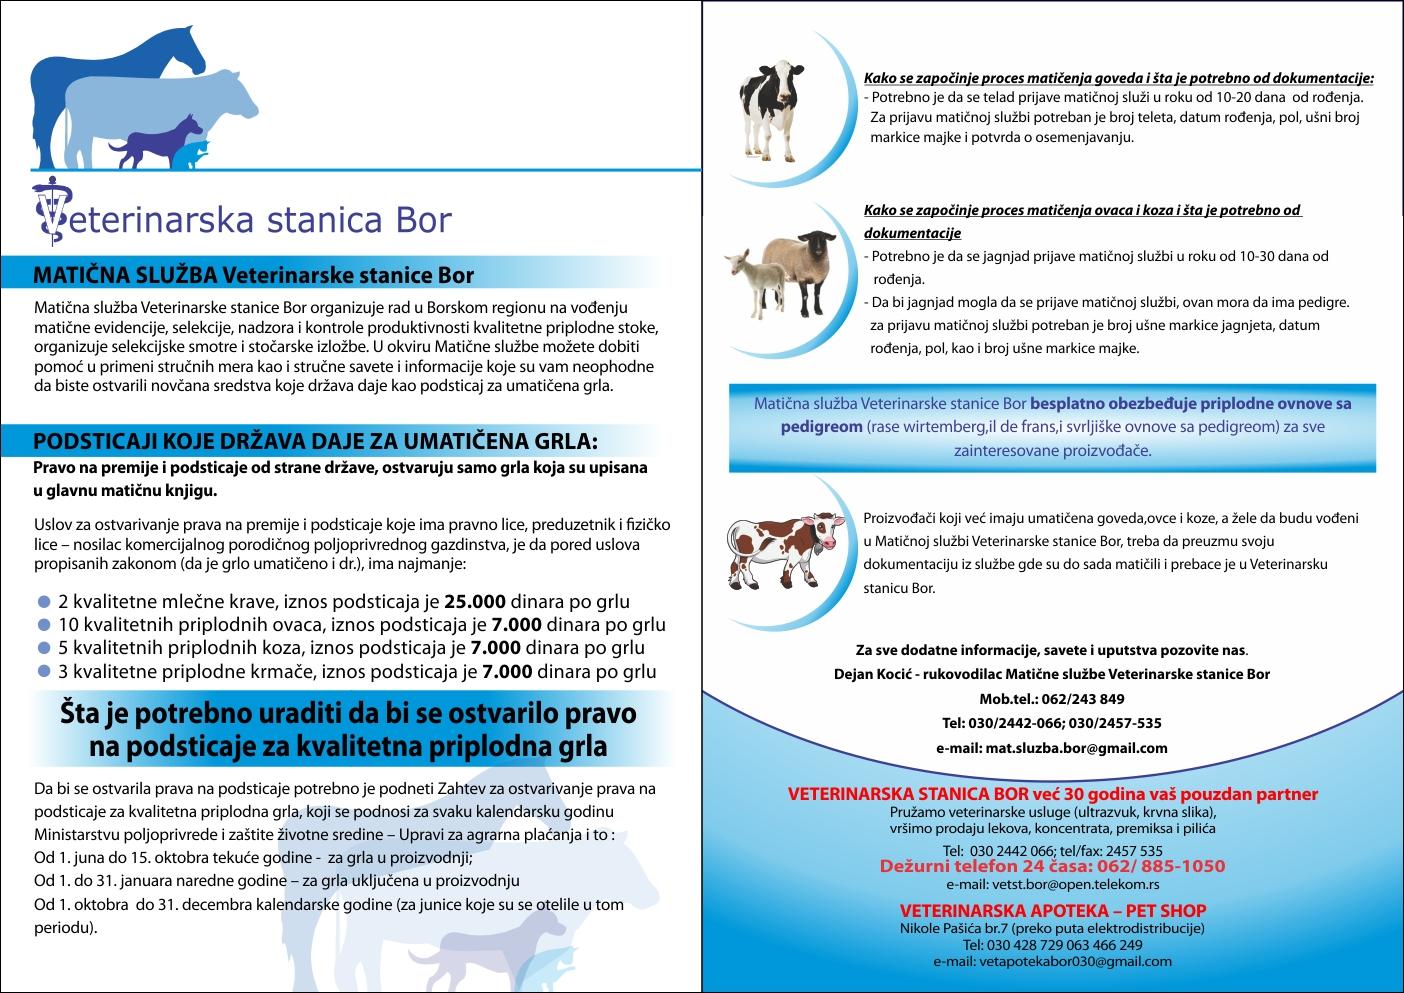 veterinarska stanica bor a5 (1)2